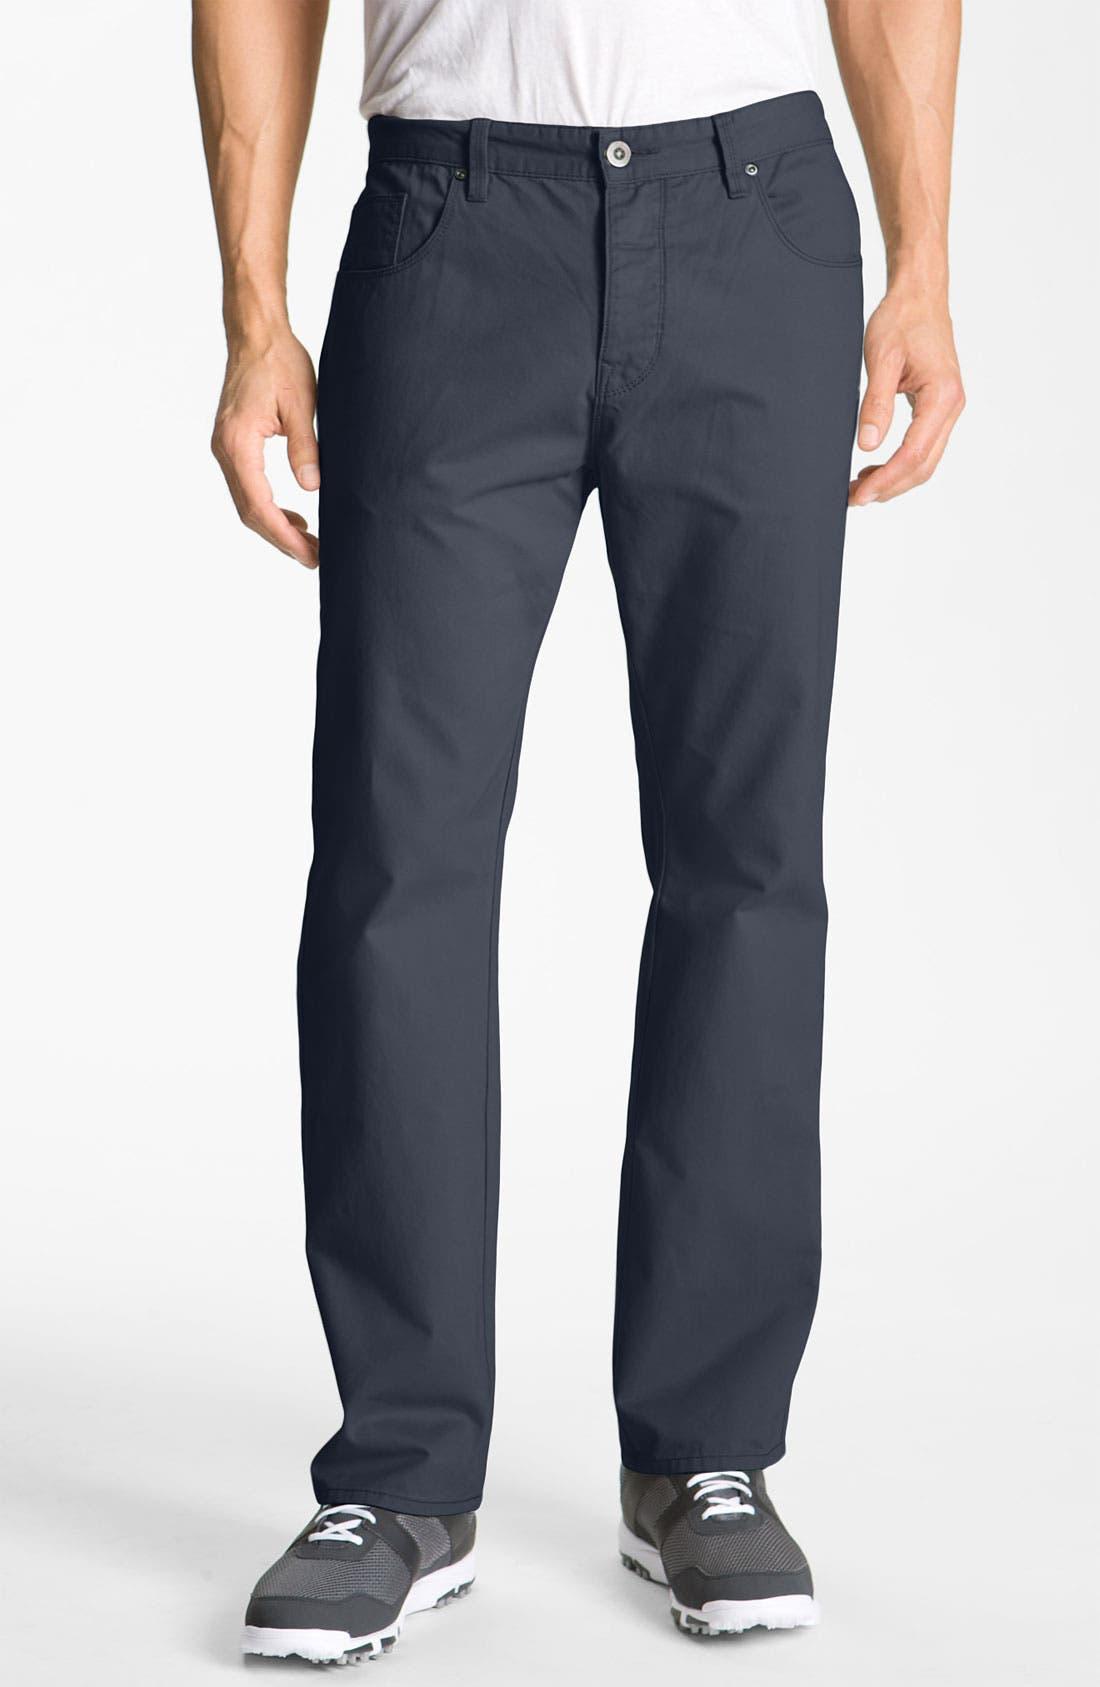 Main Image - Cutter & Buck 'Pike' Five-Pocket Pants